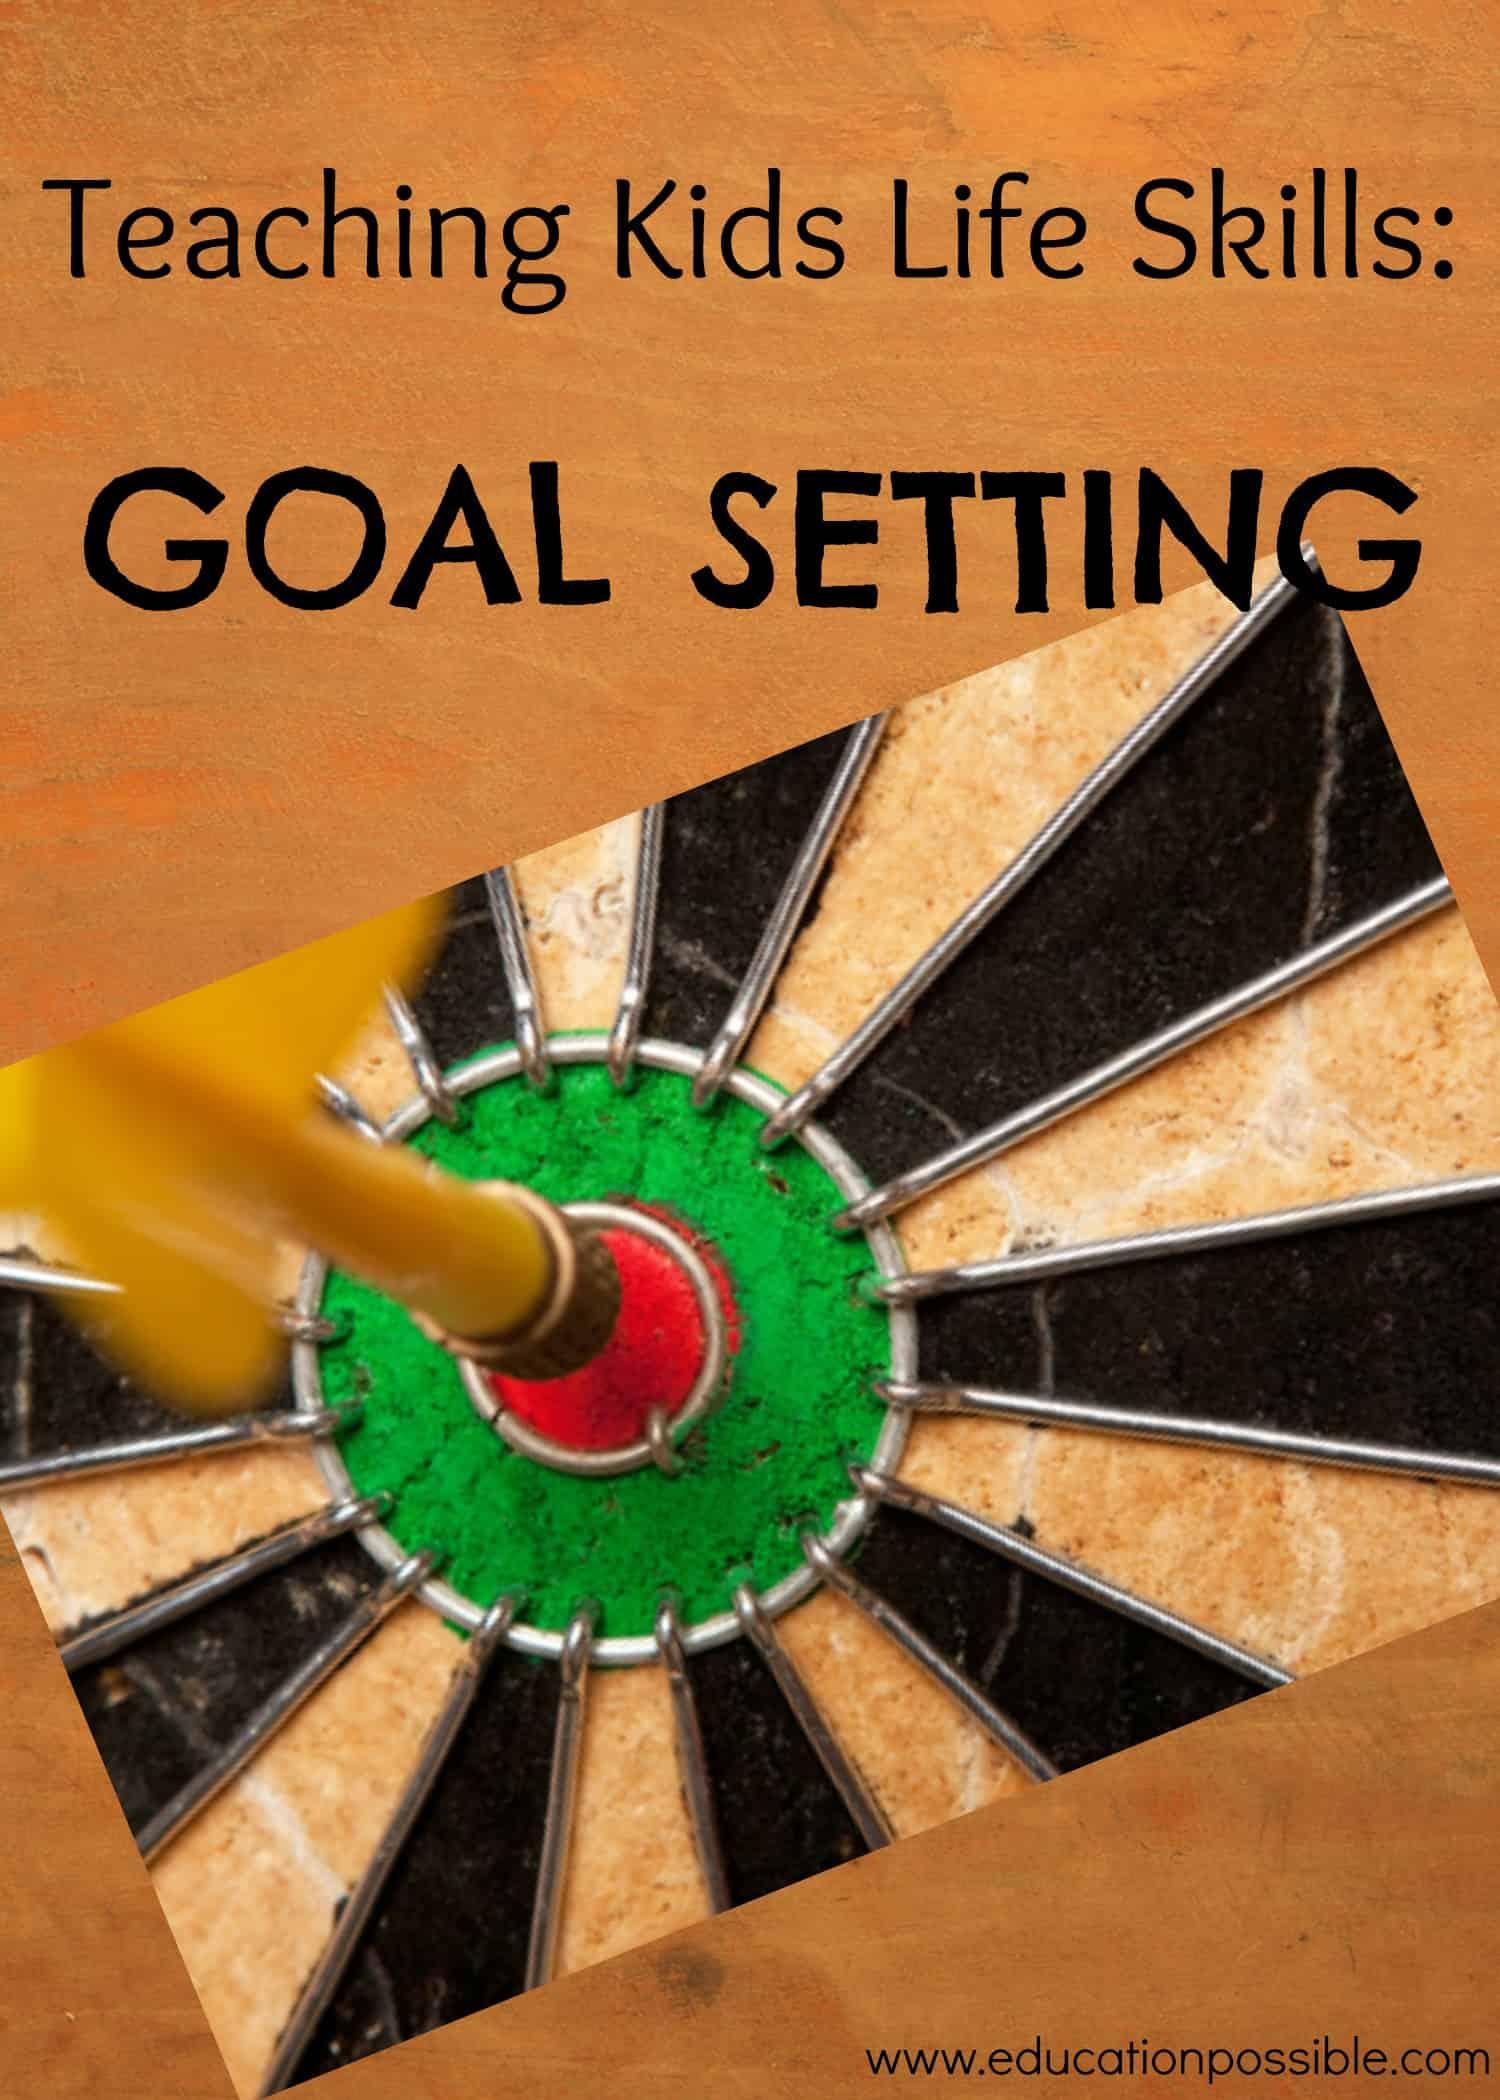 Teaching Kids Life Skills Goal Setting